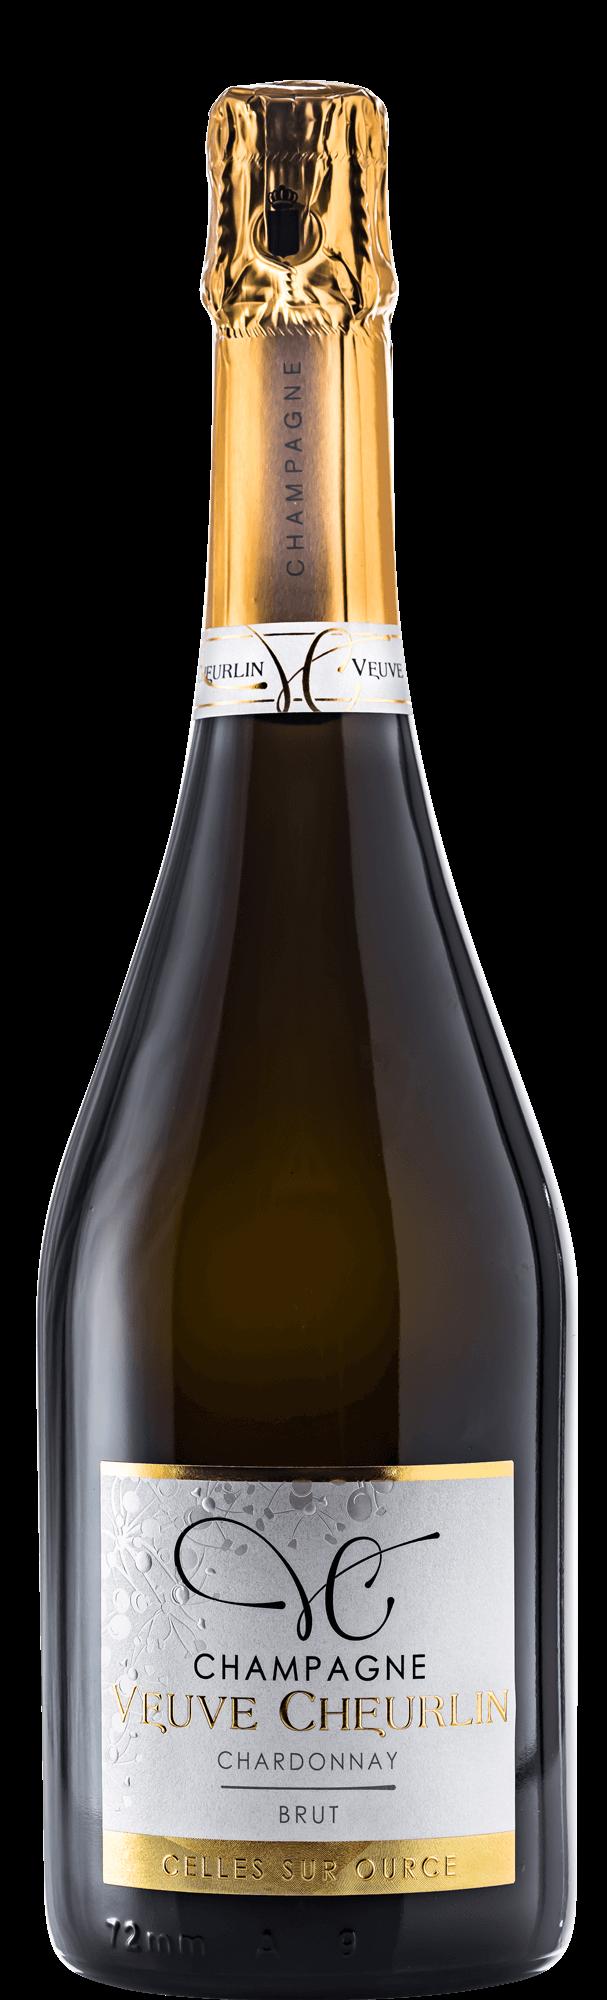 Champagne Veuve Cheurlin Chardonnay